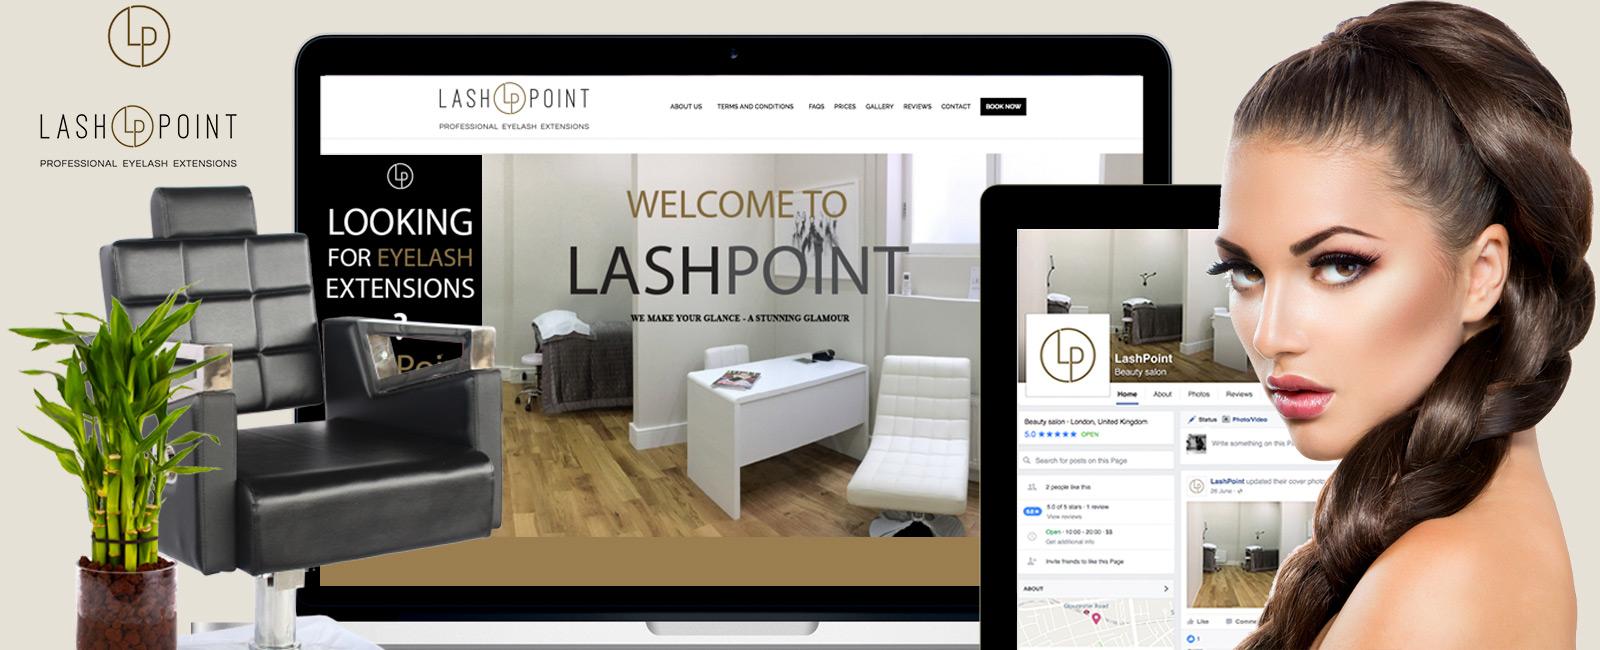 Ami Perera Work portfolio Lash Point London web and branding